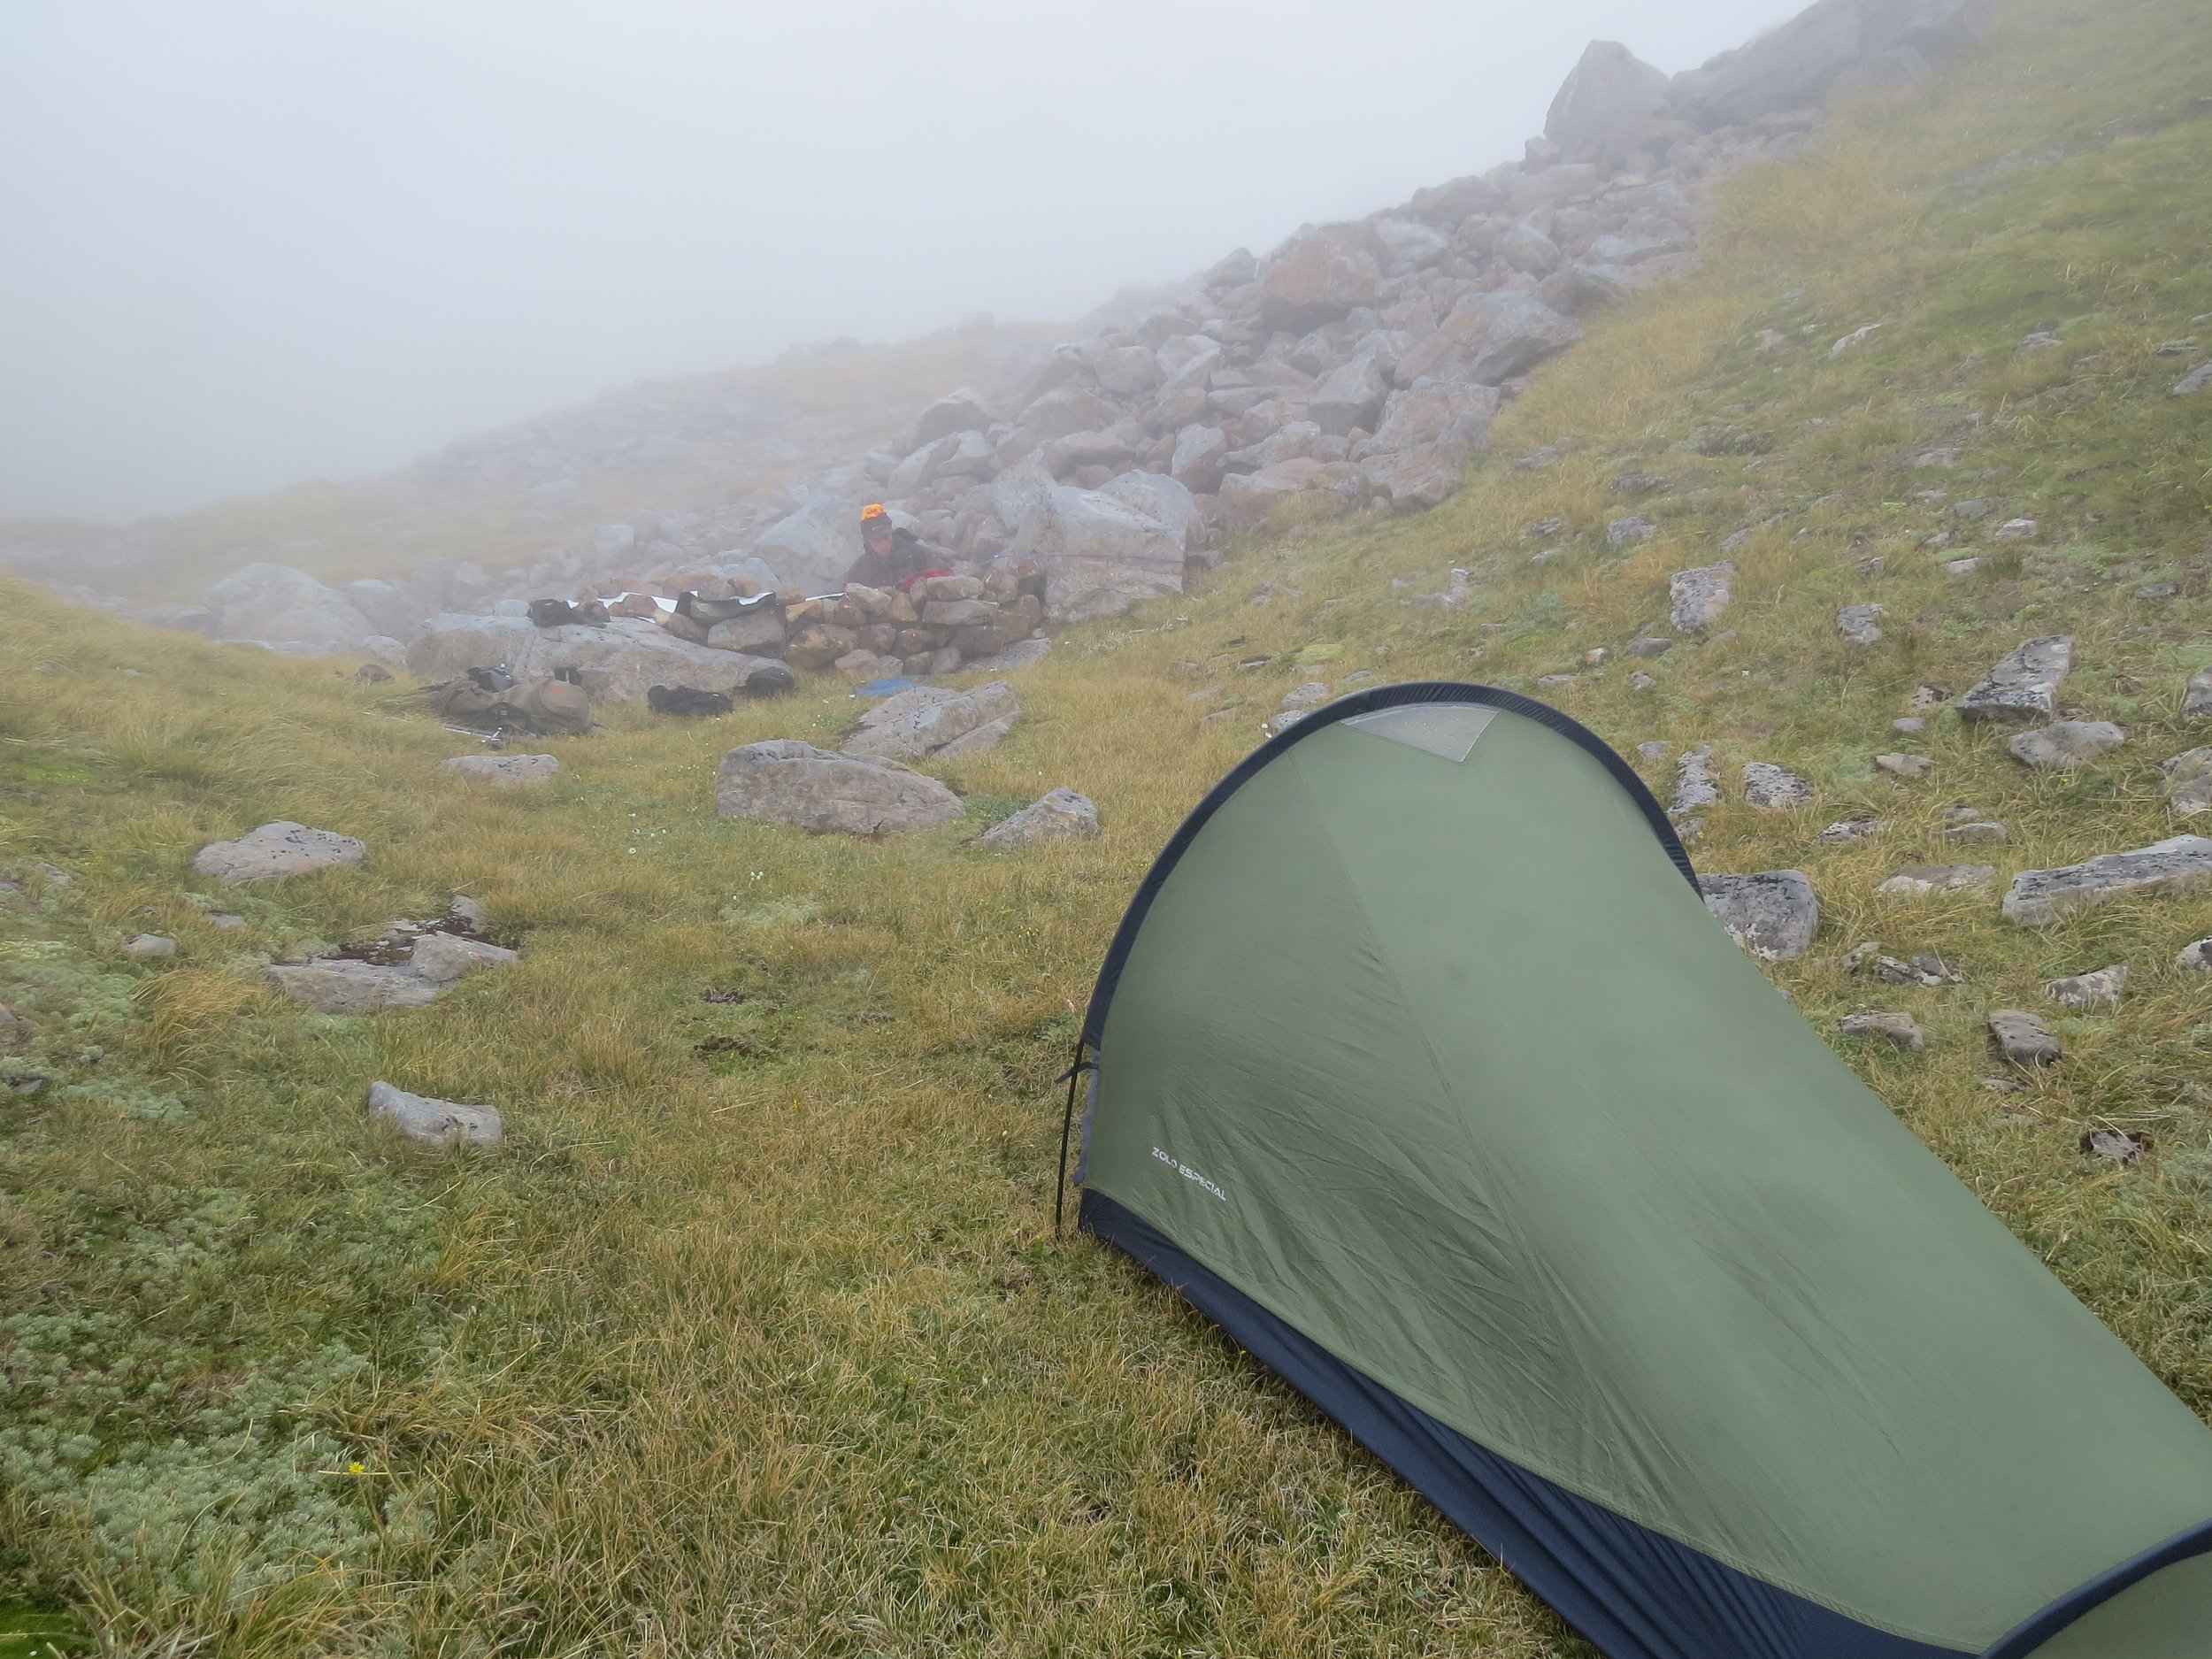 A bivy tent definitely adds a bit of comfort.